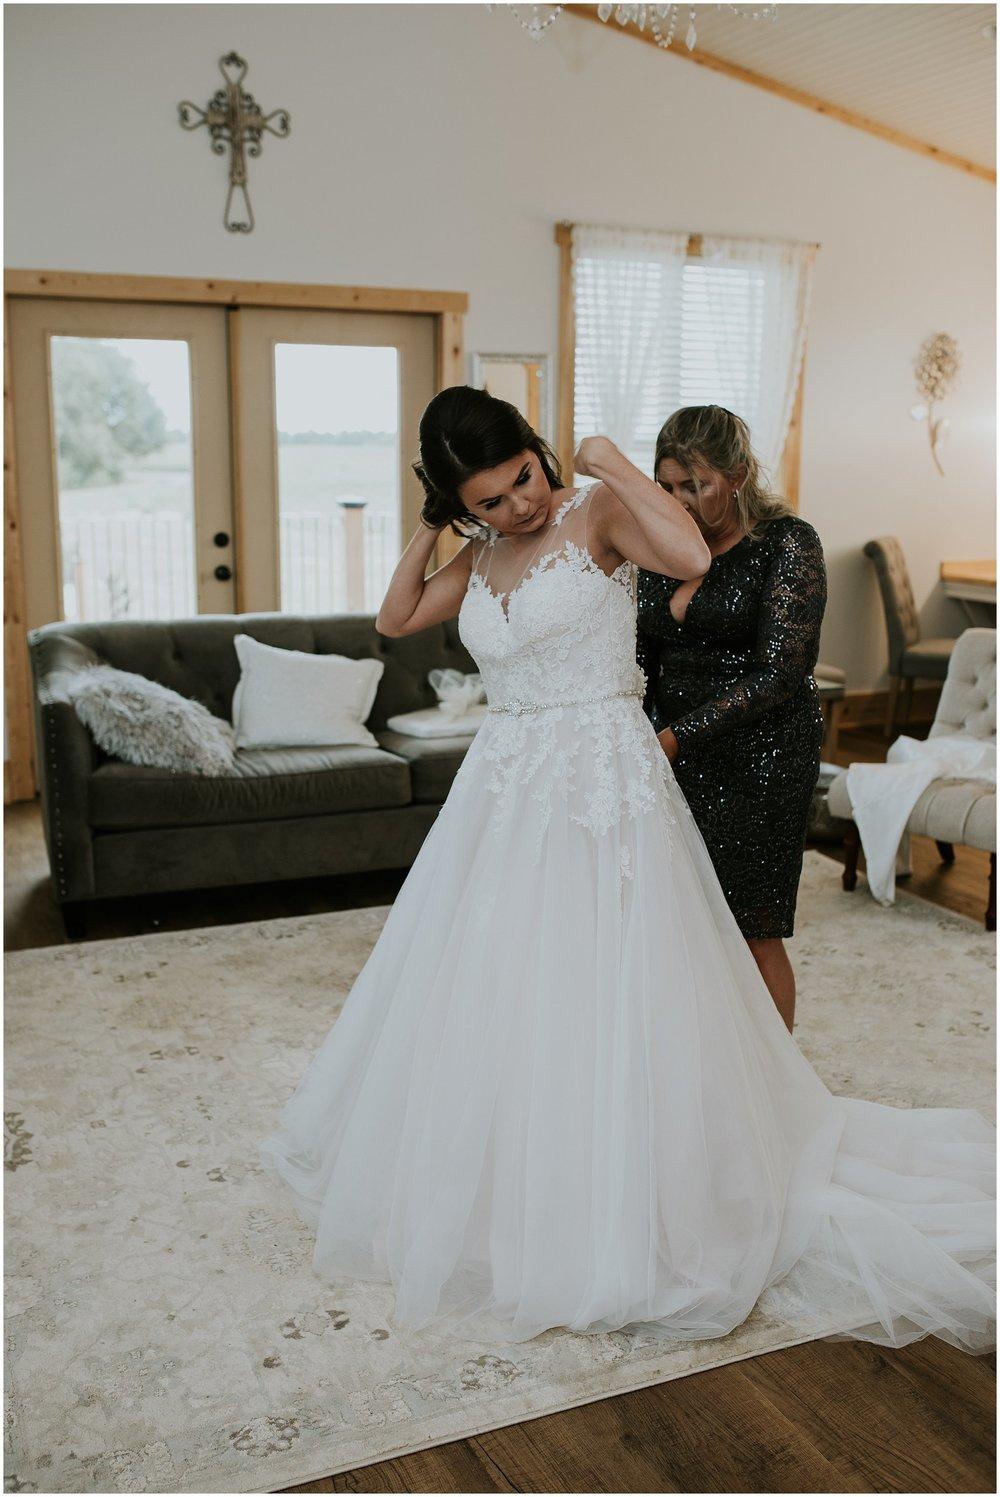 201809180017: Kimberly Perry Wedding Dress At Reisefeber.org